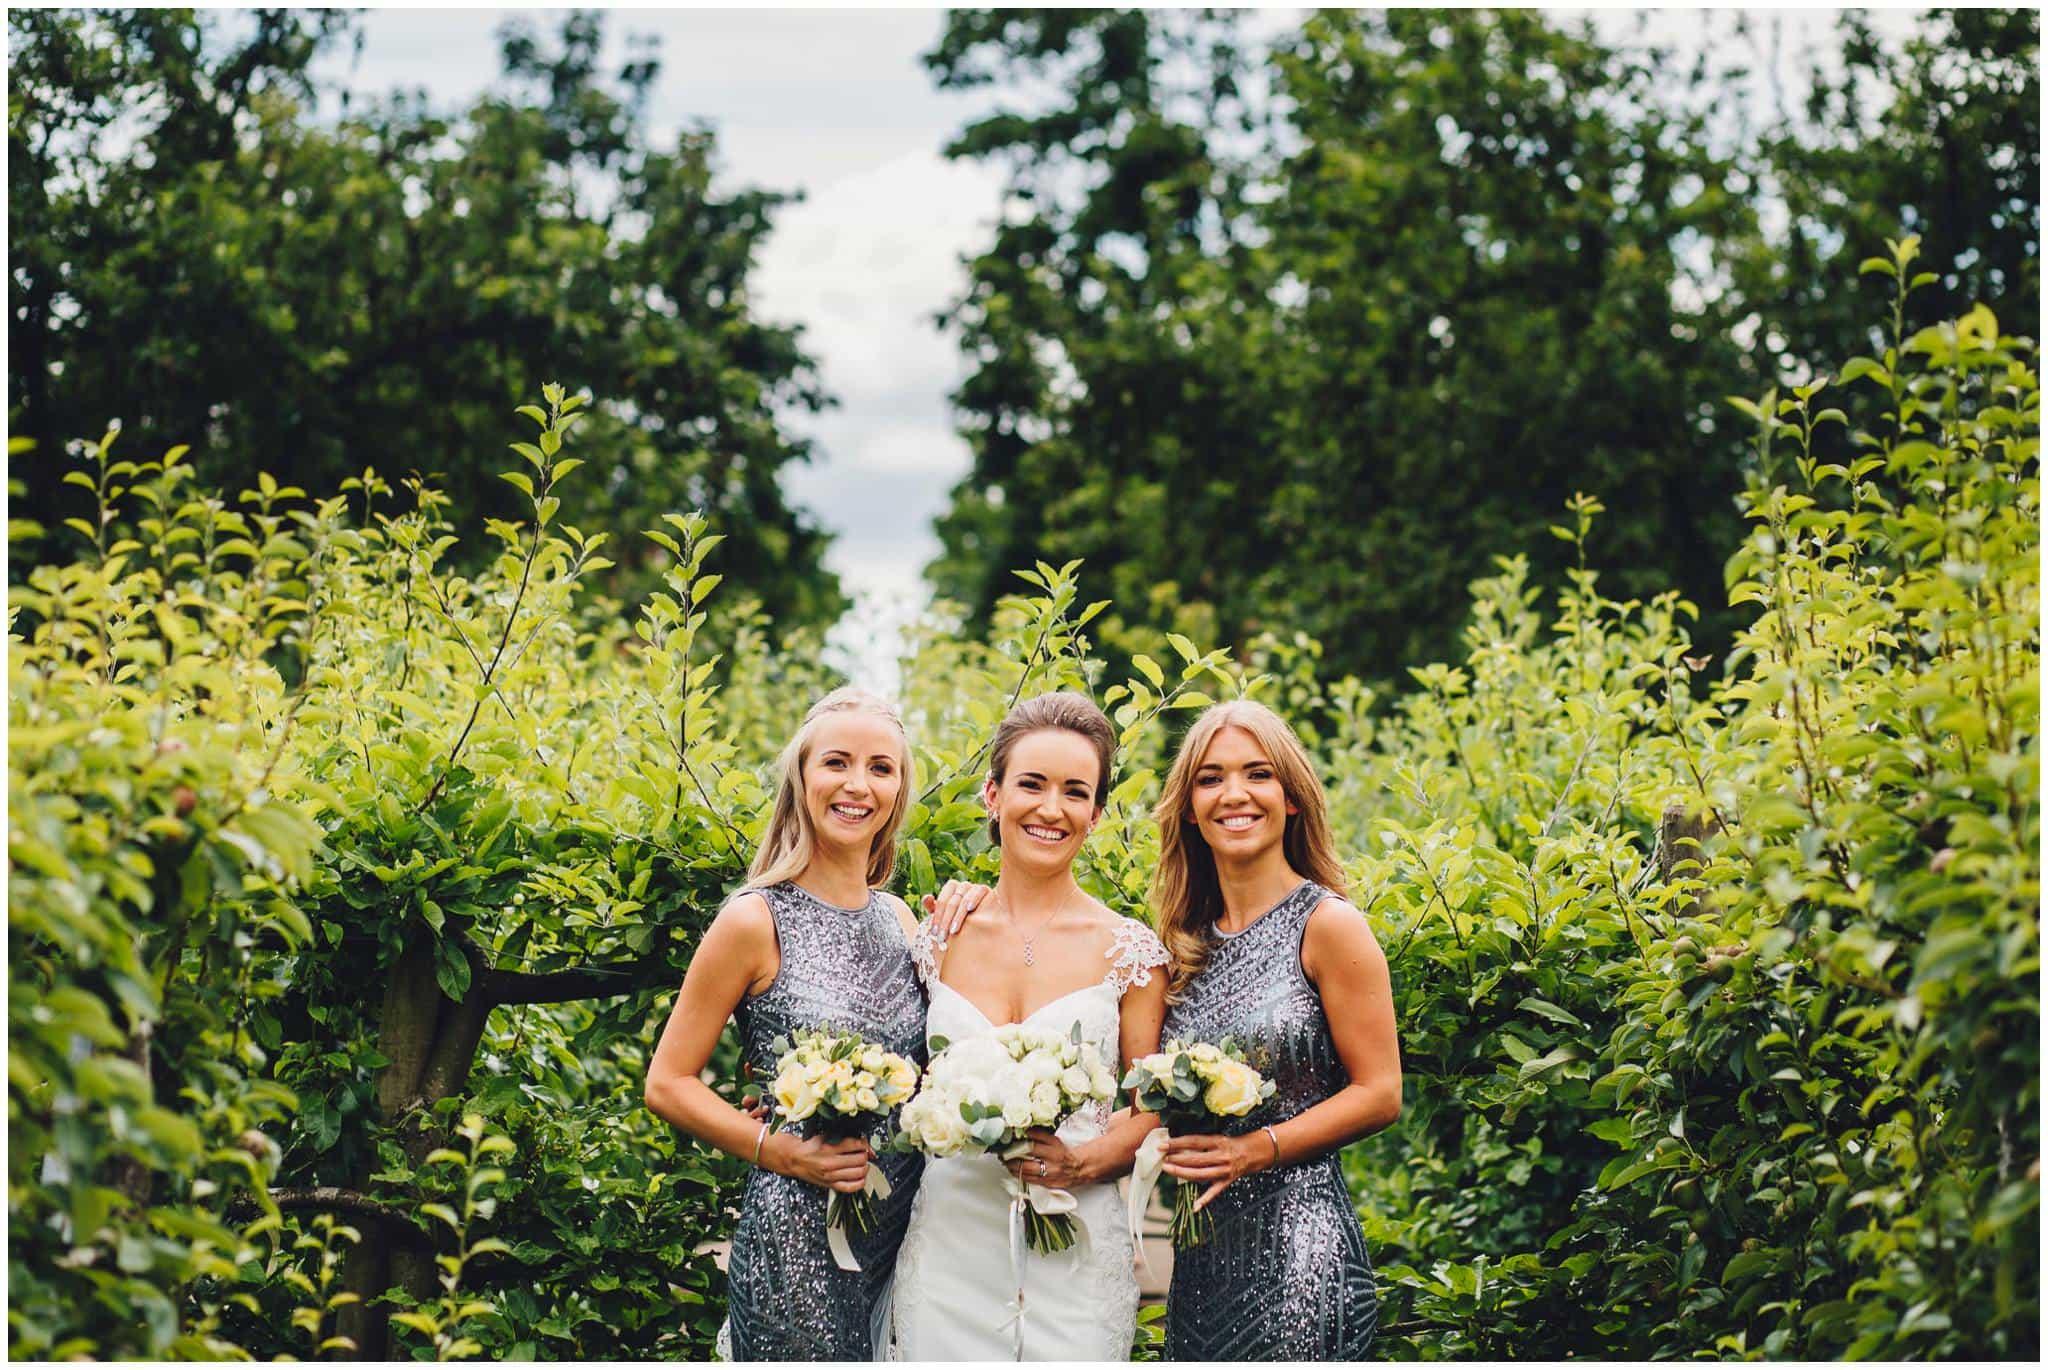 combermere-abbey-wedding-photographer-57